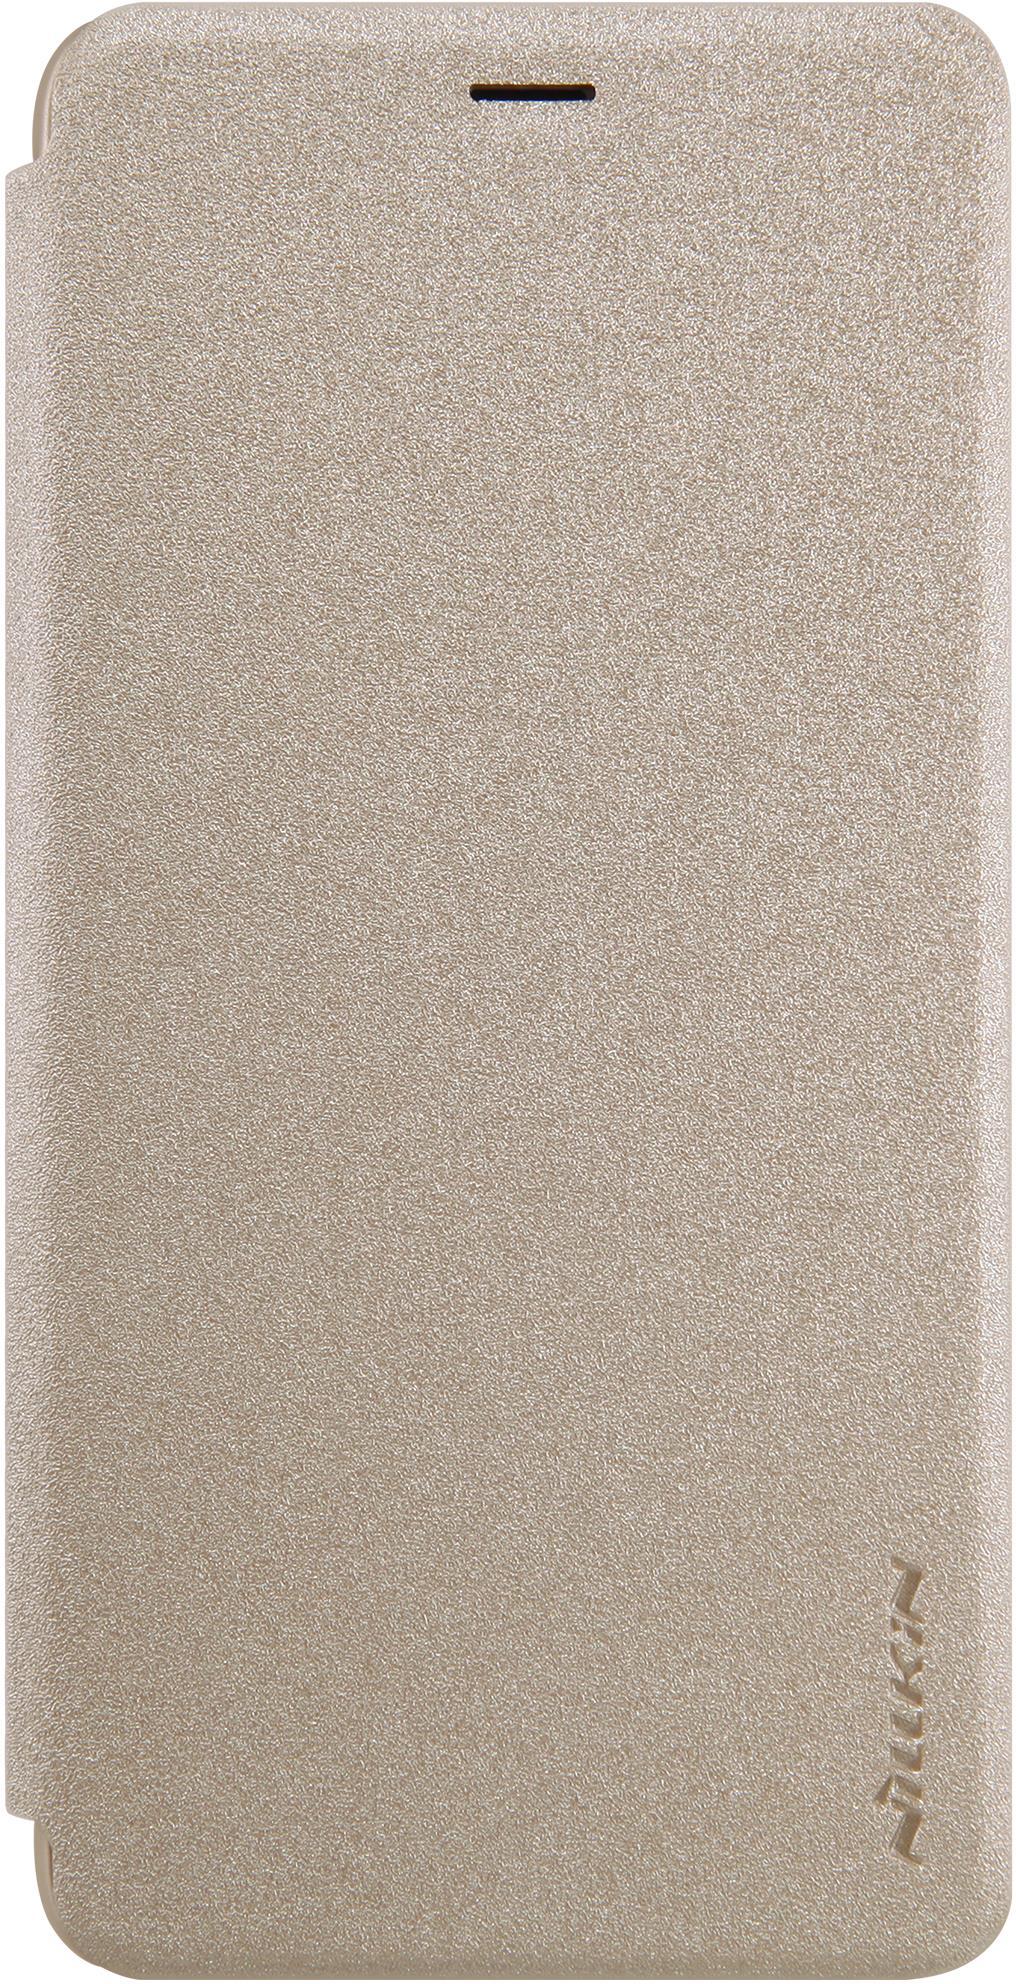 Чехол для сотового телефона Nillkin T-N-MM3S-009, золотой nillkin meizu pro7 матовый телефон защитная крышка чехол чехол для мобильного телефона черный